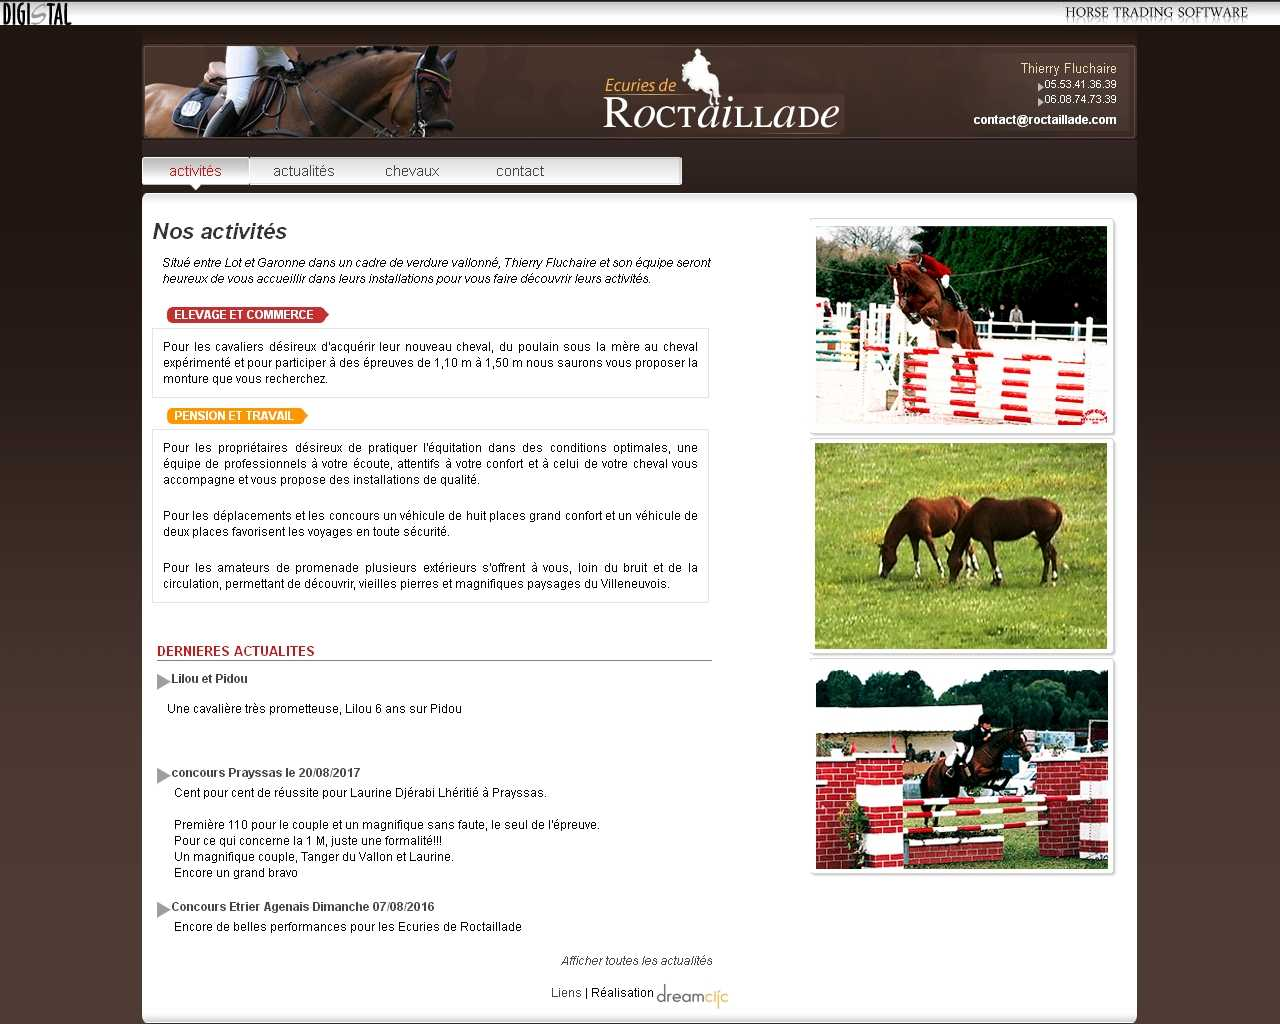 Visuel du site Ecuries de Roctaillade